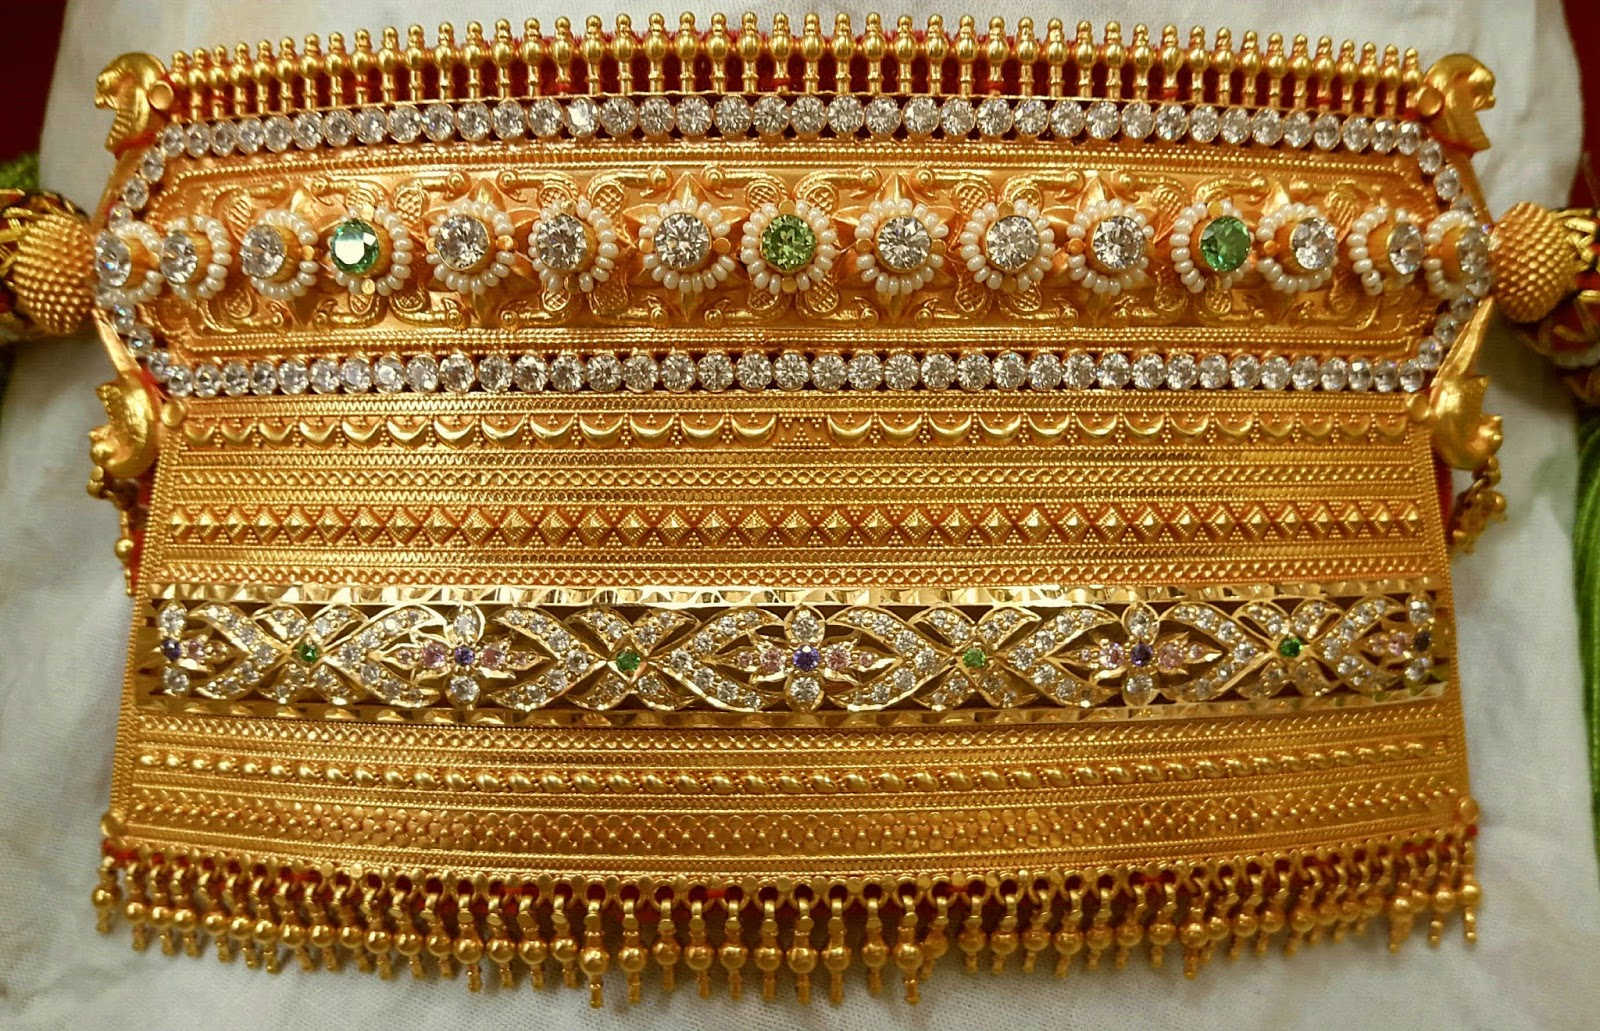 Rajasthani Aad Necklaces Sudhakar Gold Works